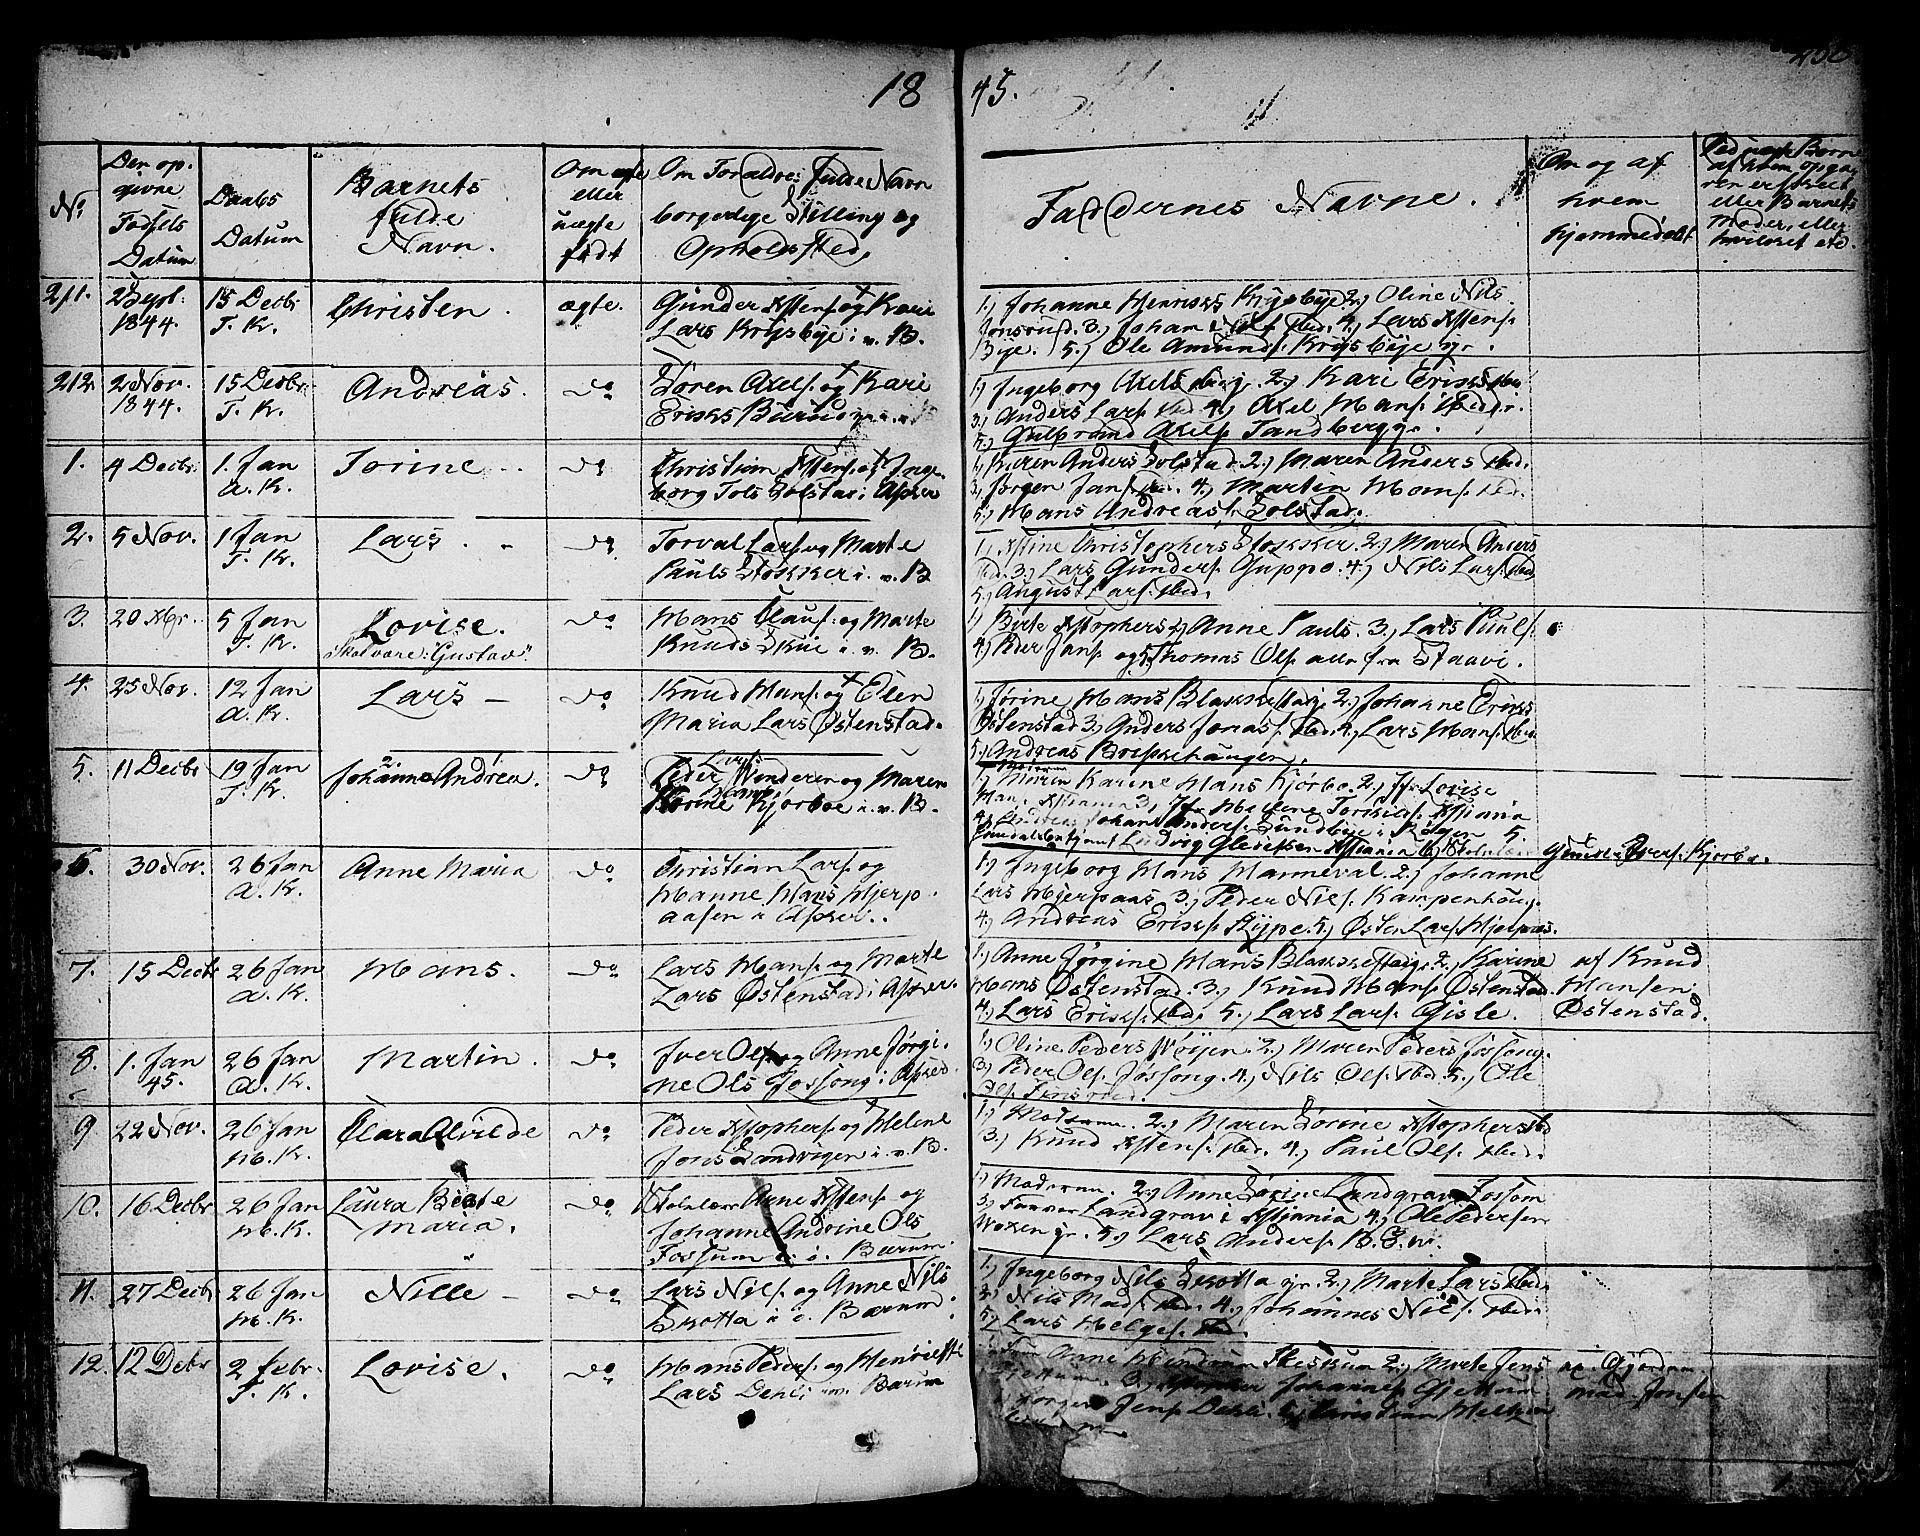 SAO, Asker prestekontor Kirkebøker, F/Fa/L0007: Parish register (official) no. I 7, 1825-1864, p. 238